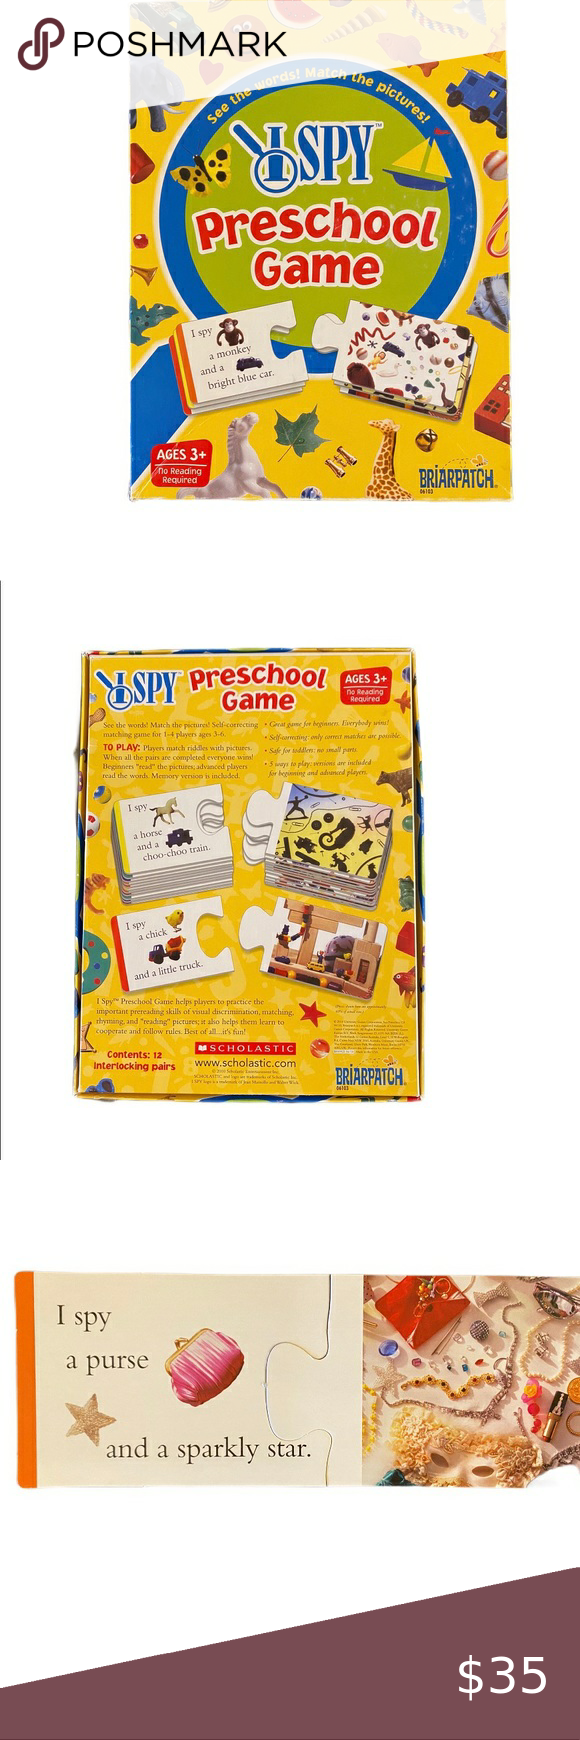 I SPY Preschool Game in 2020 Preschool games, Rhyming